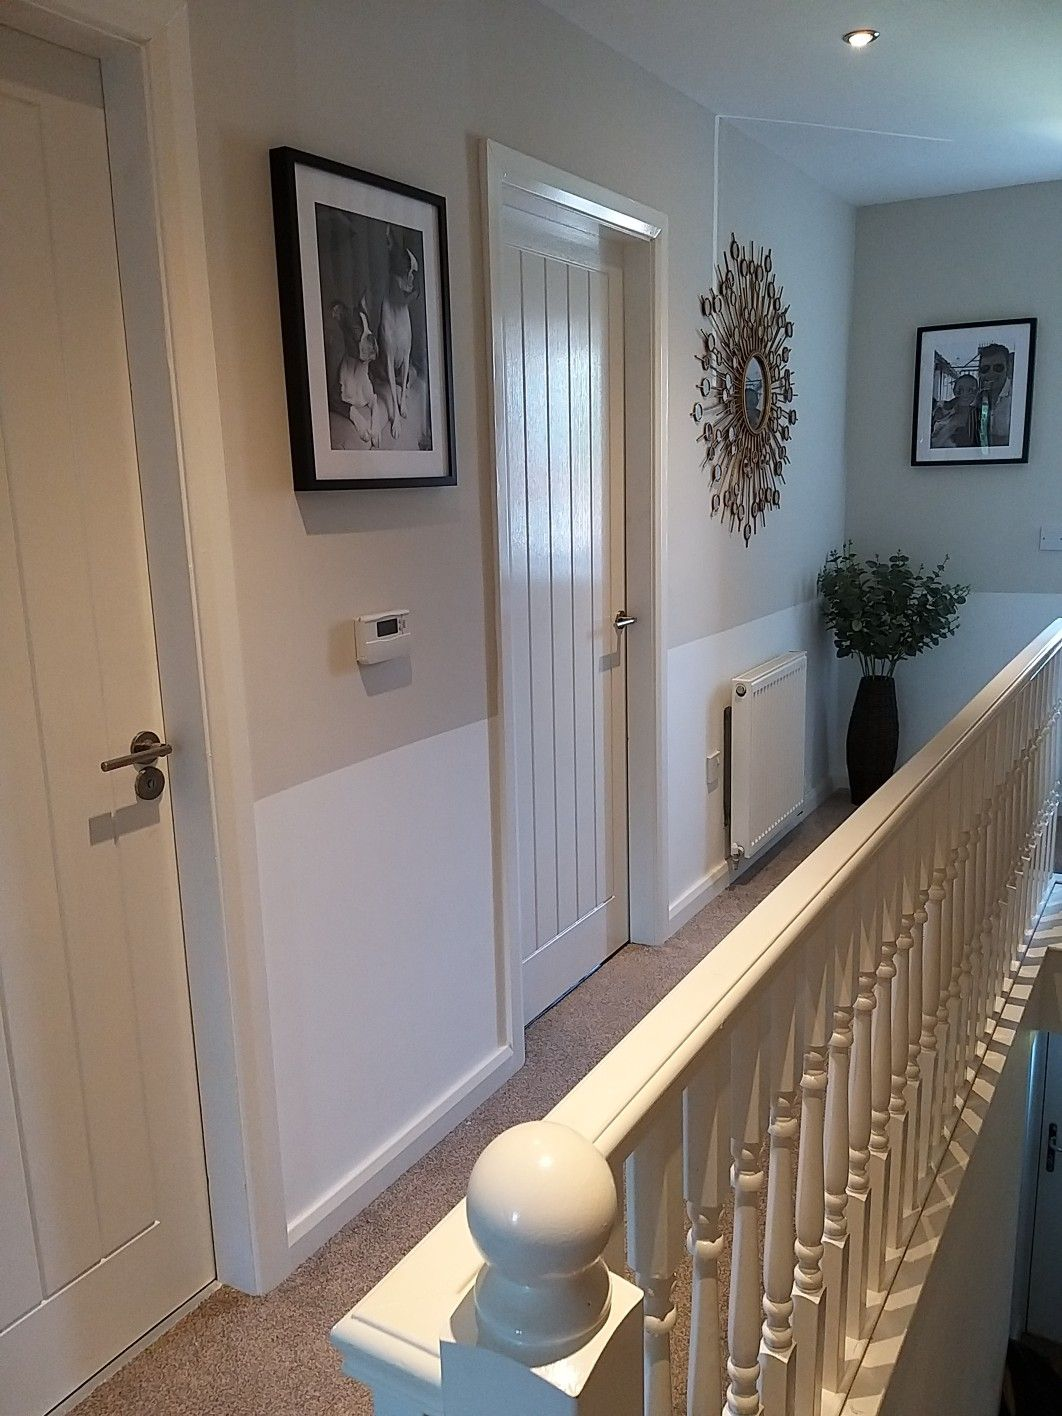 44+ Half wall ideas for entryway ideas in 2021